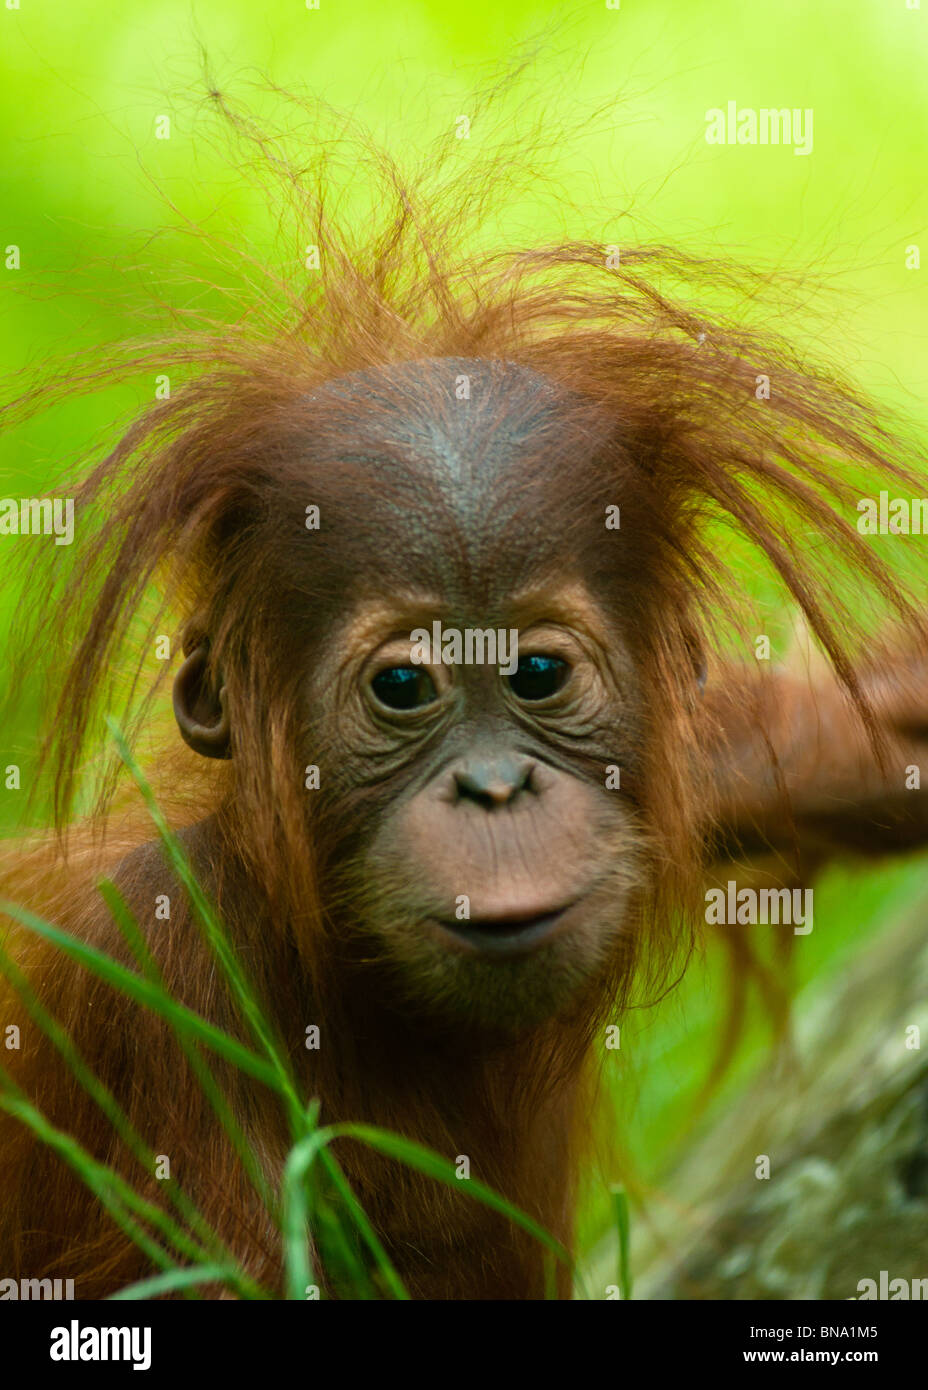 Baby Orangutan (Pongo pygmaeus) fino in prossimità. Foto Stock